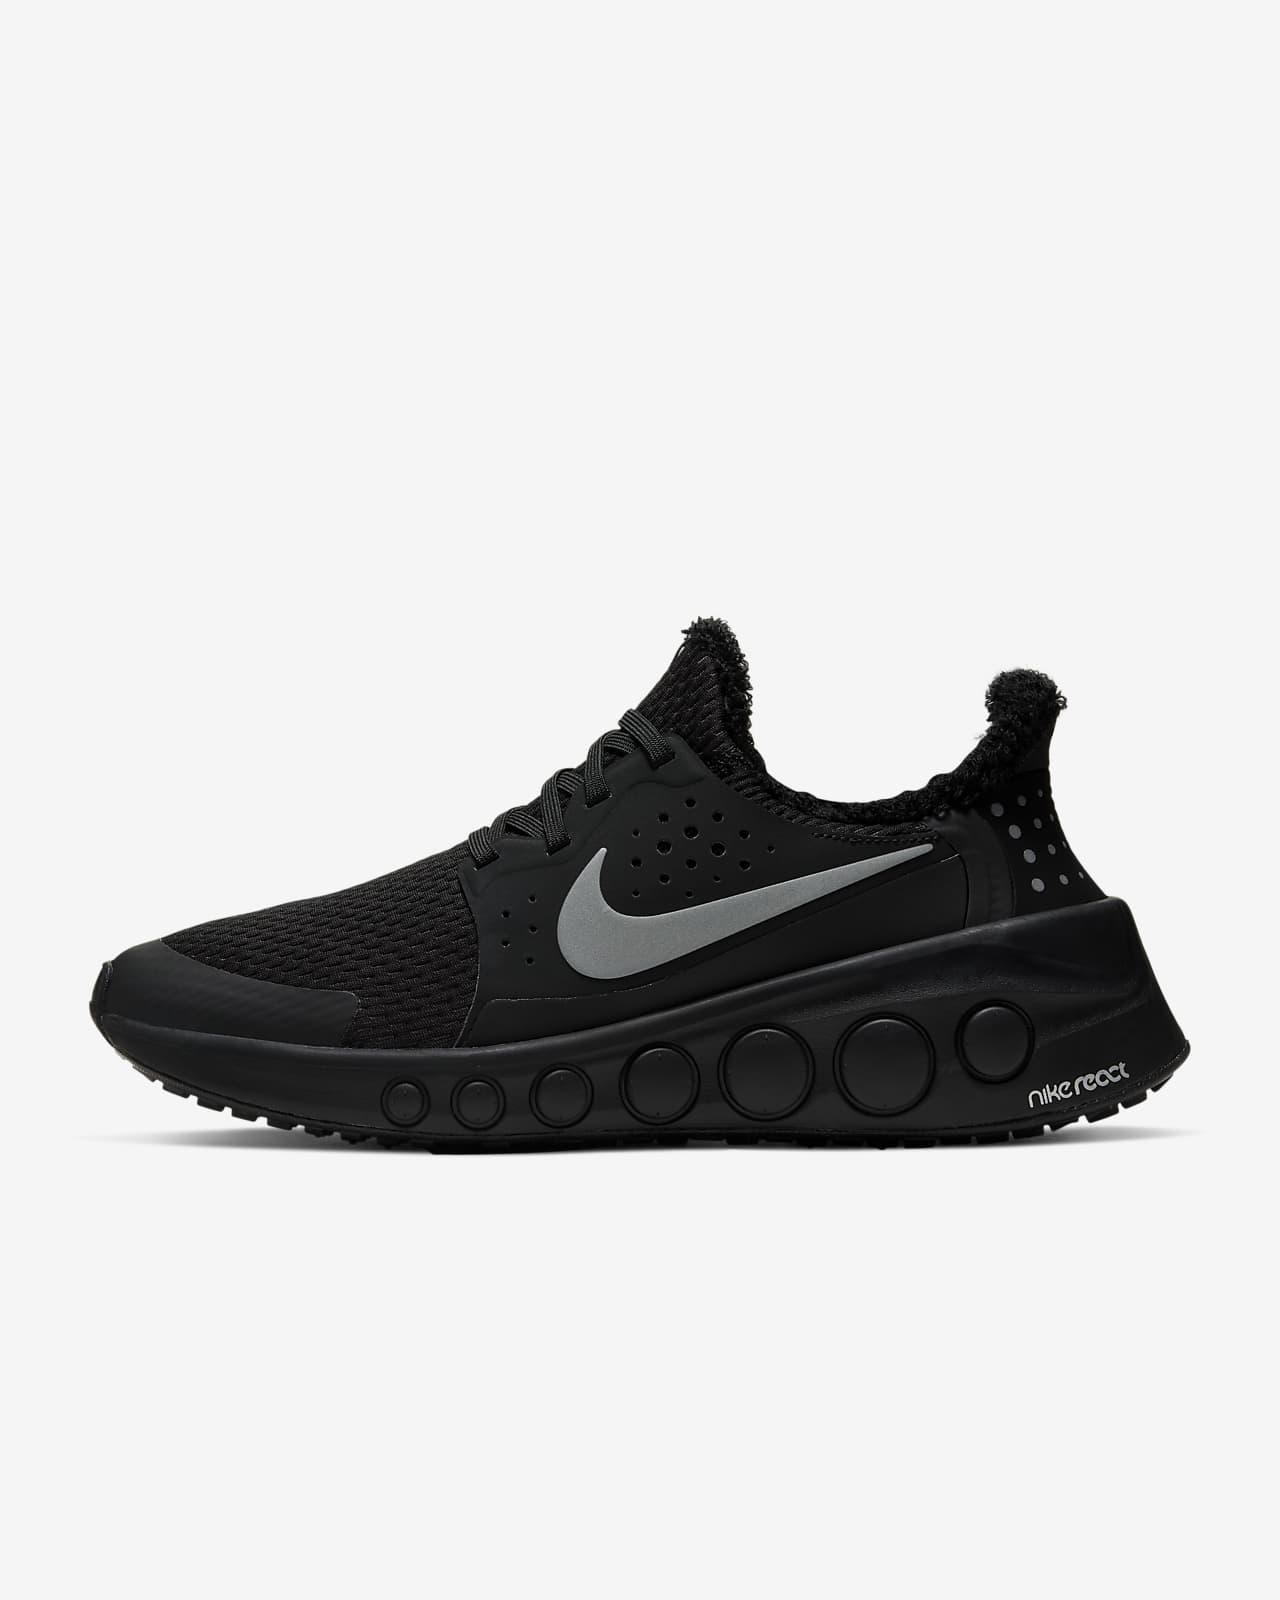 Nike CruzrOne (Triple Black) Shoe